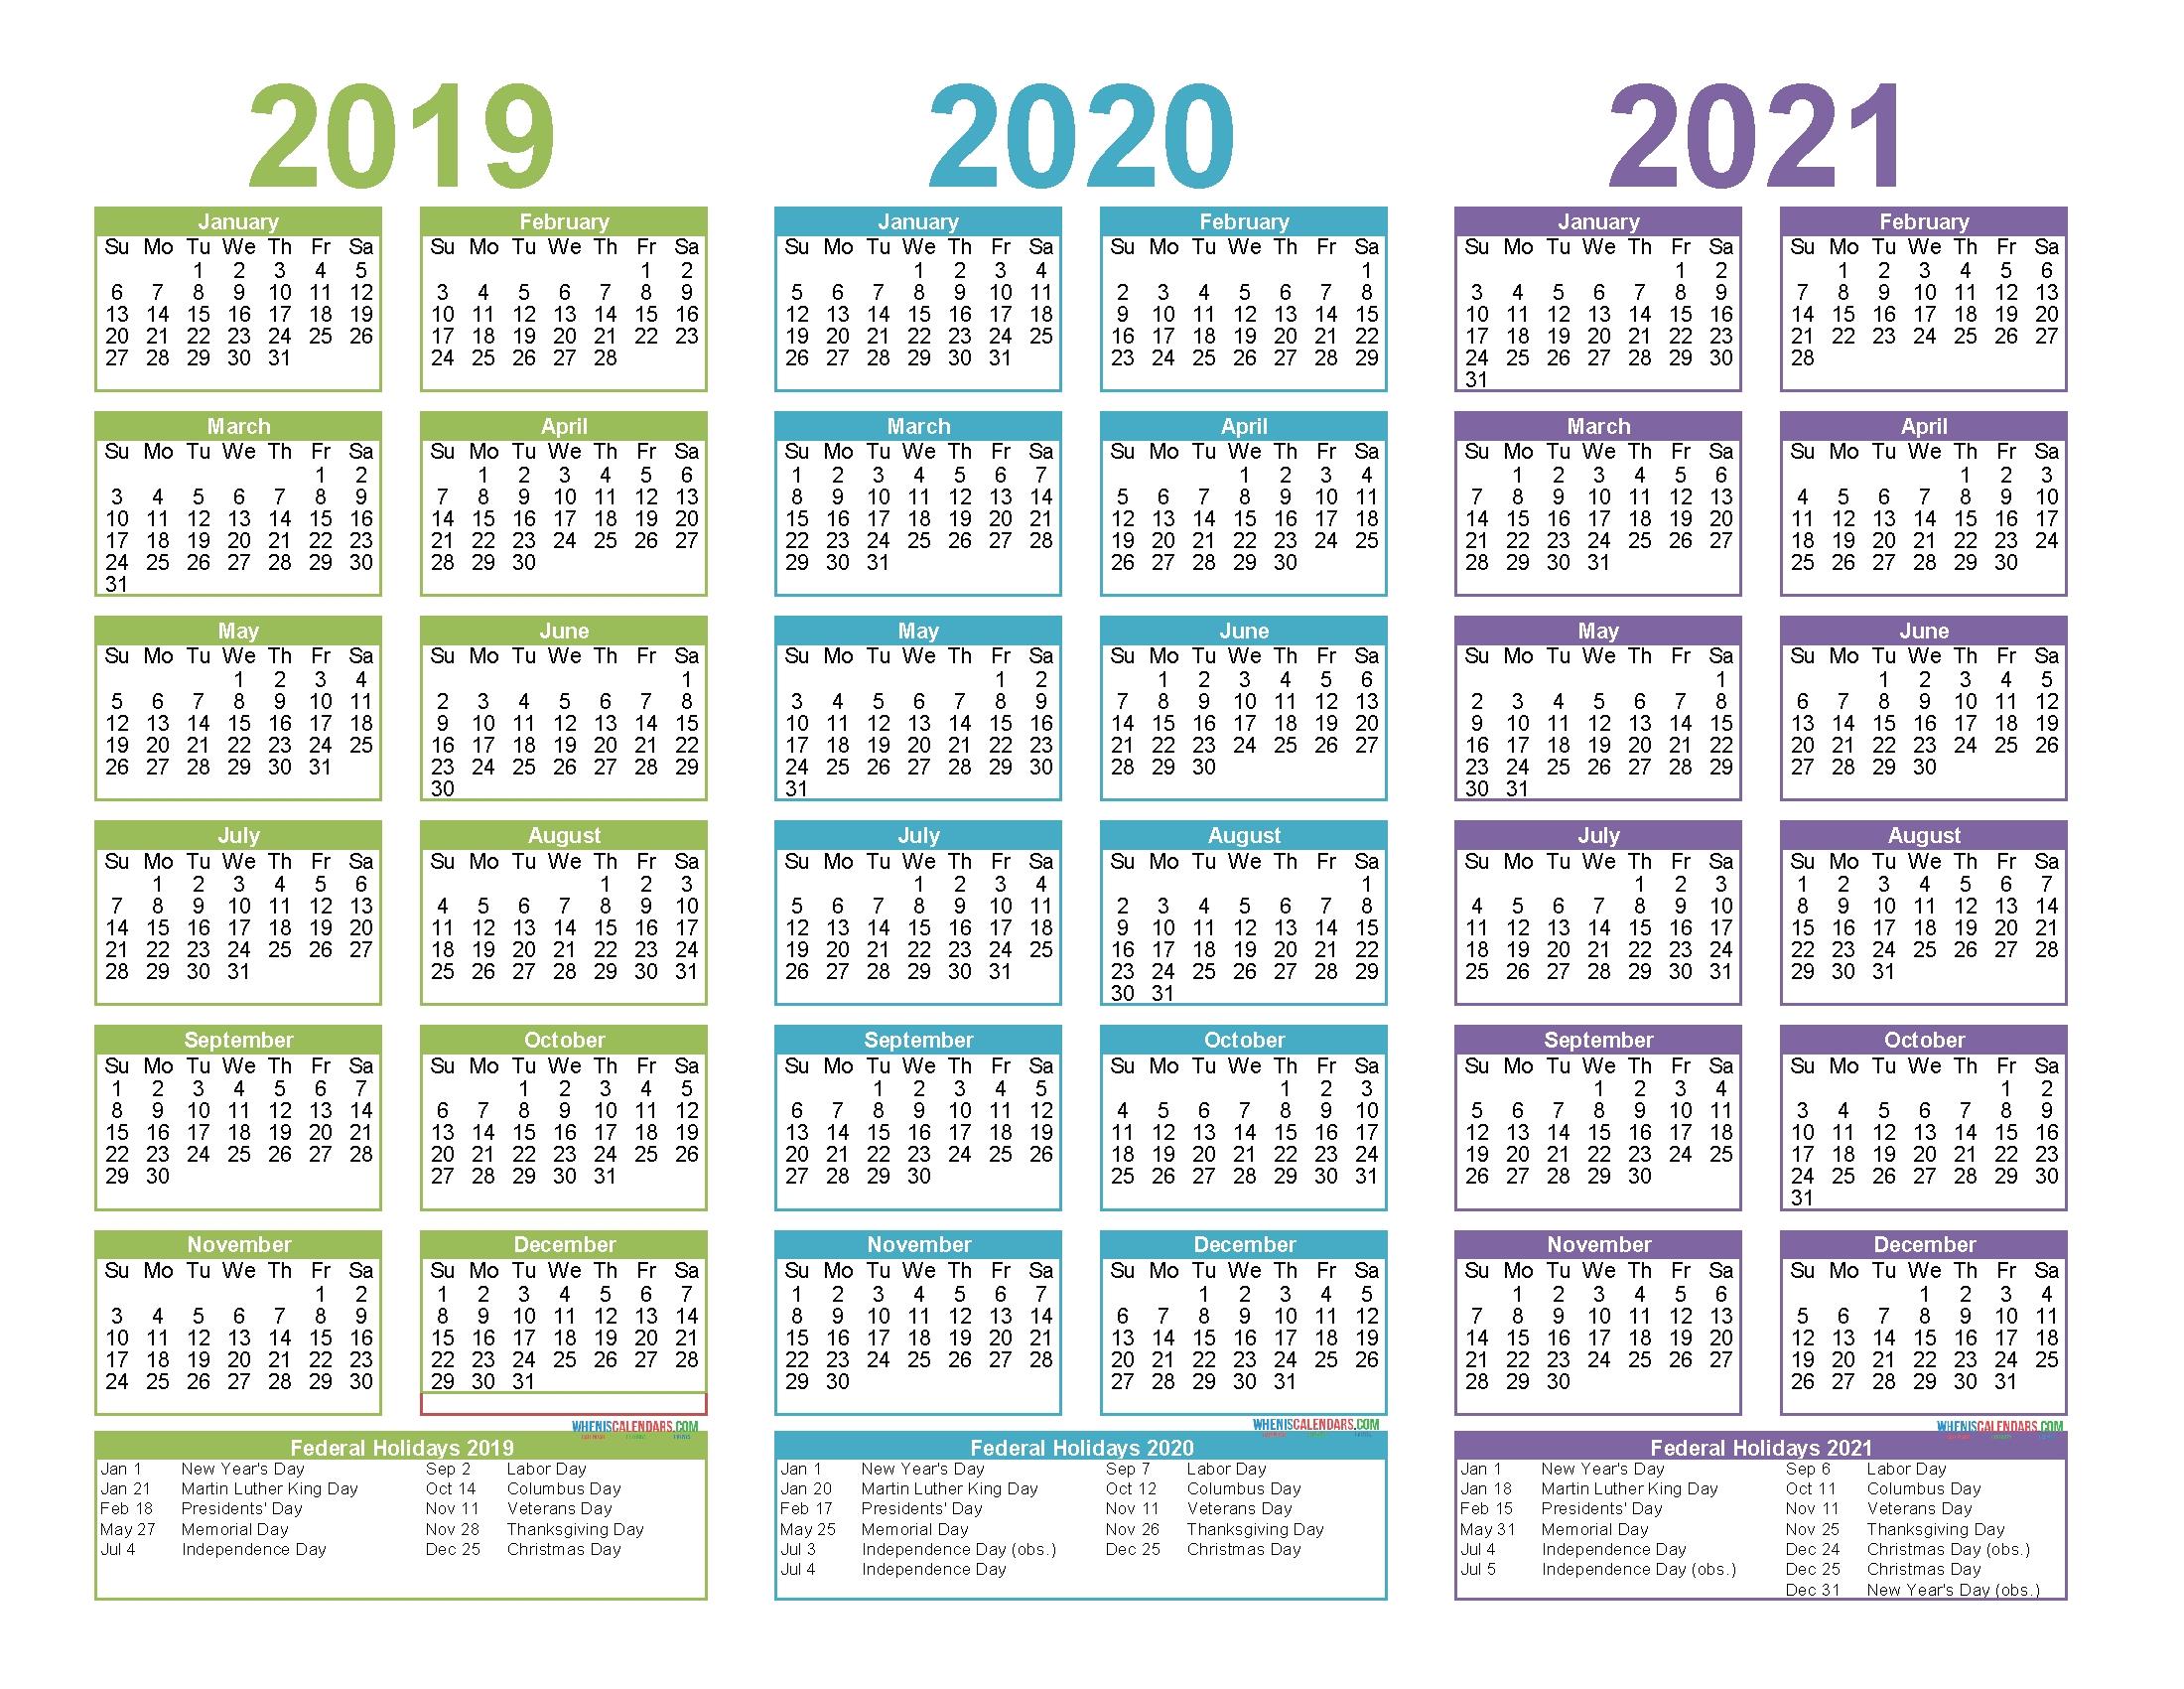 2019 To 2021 3 Year Calendar Printable Free Pdf, Word, Image inside 3 Year Calendar 2019 2020 2021 Printable